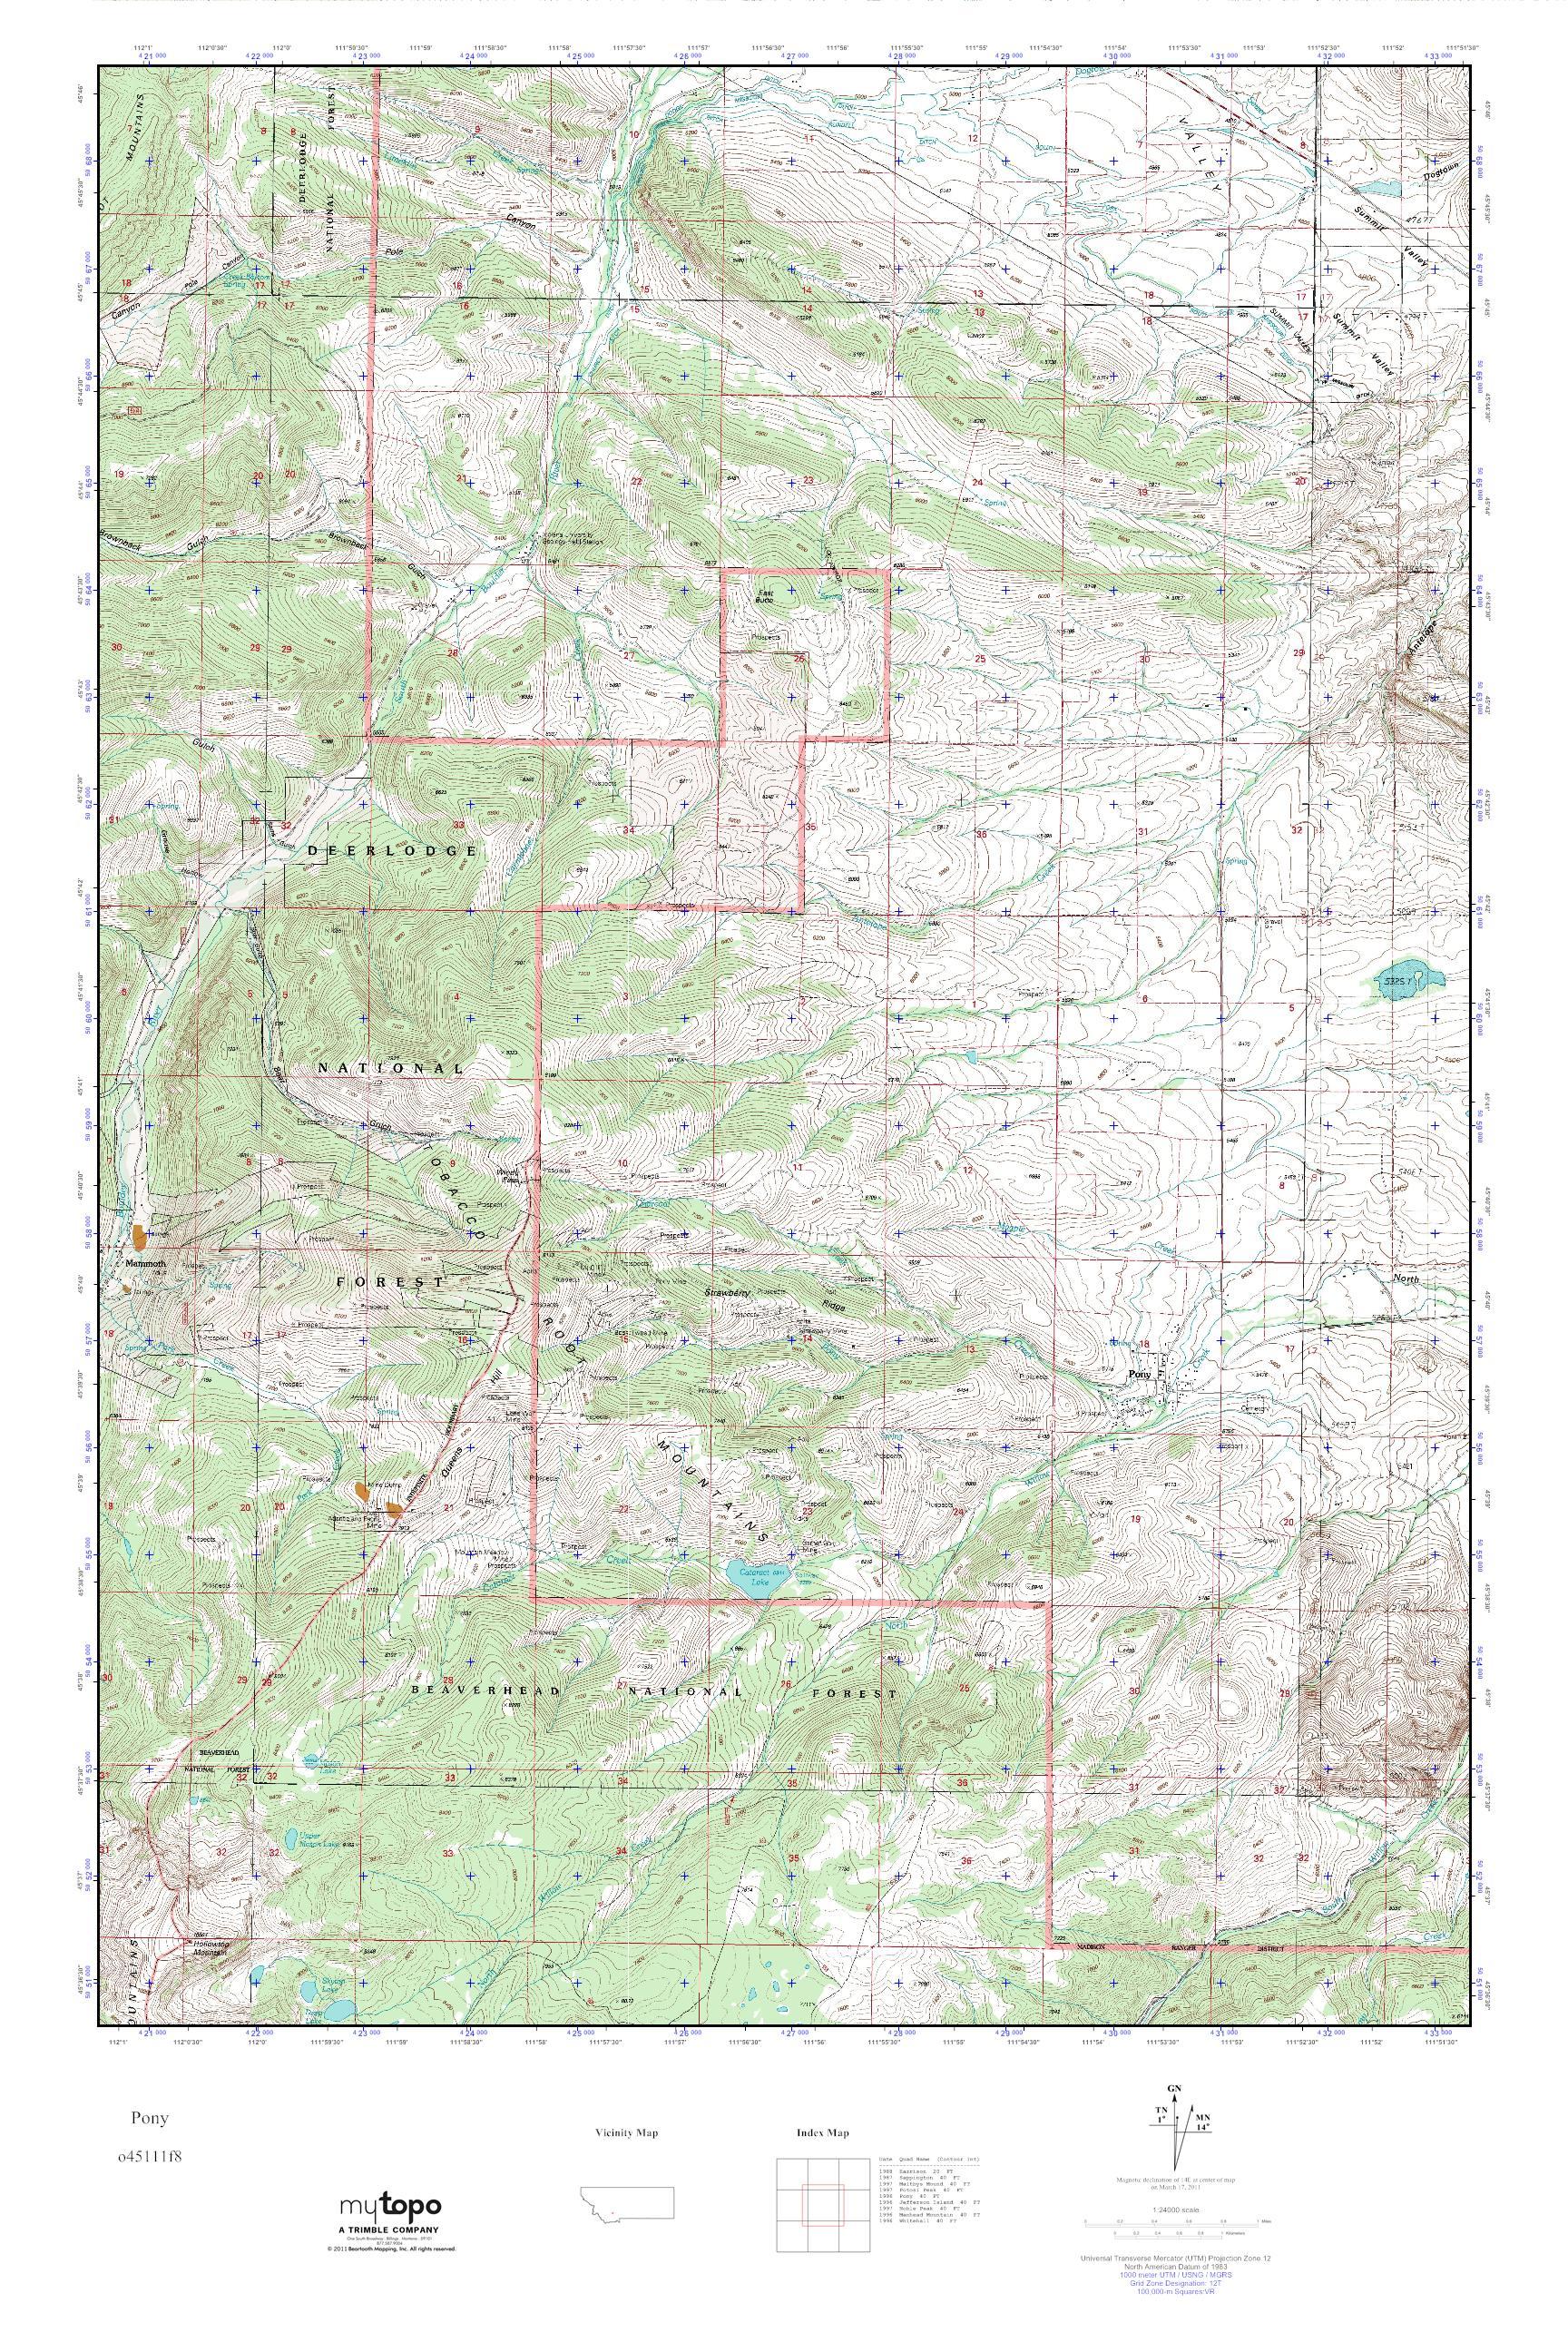 Pony Montana Map.Mytopo Pony Montana Usgs Quad Topo Map